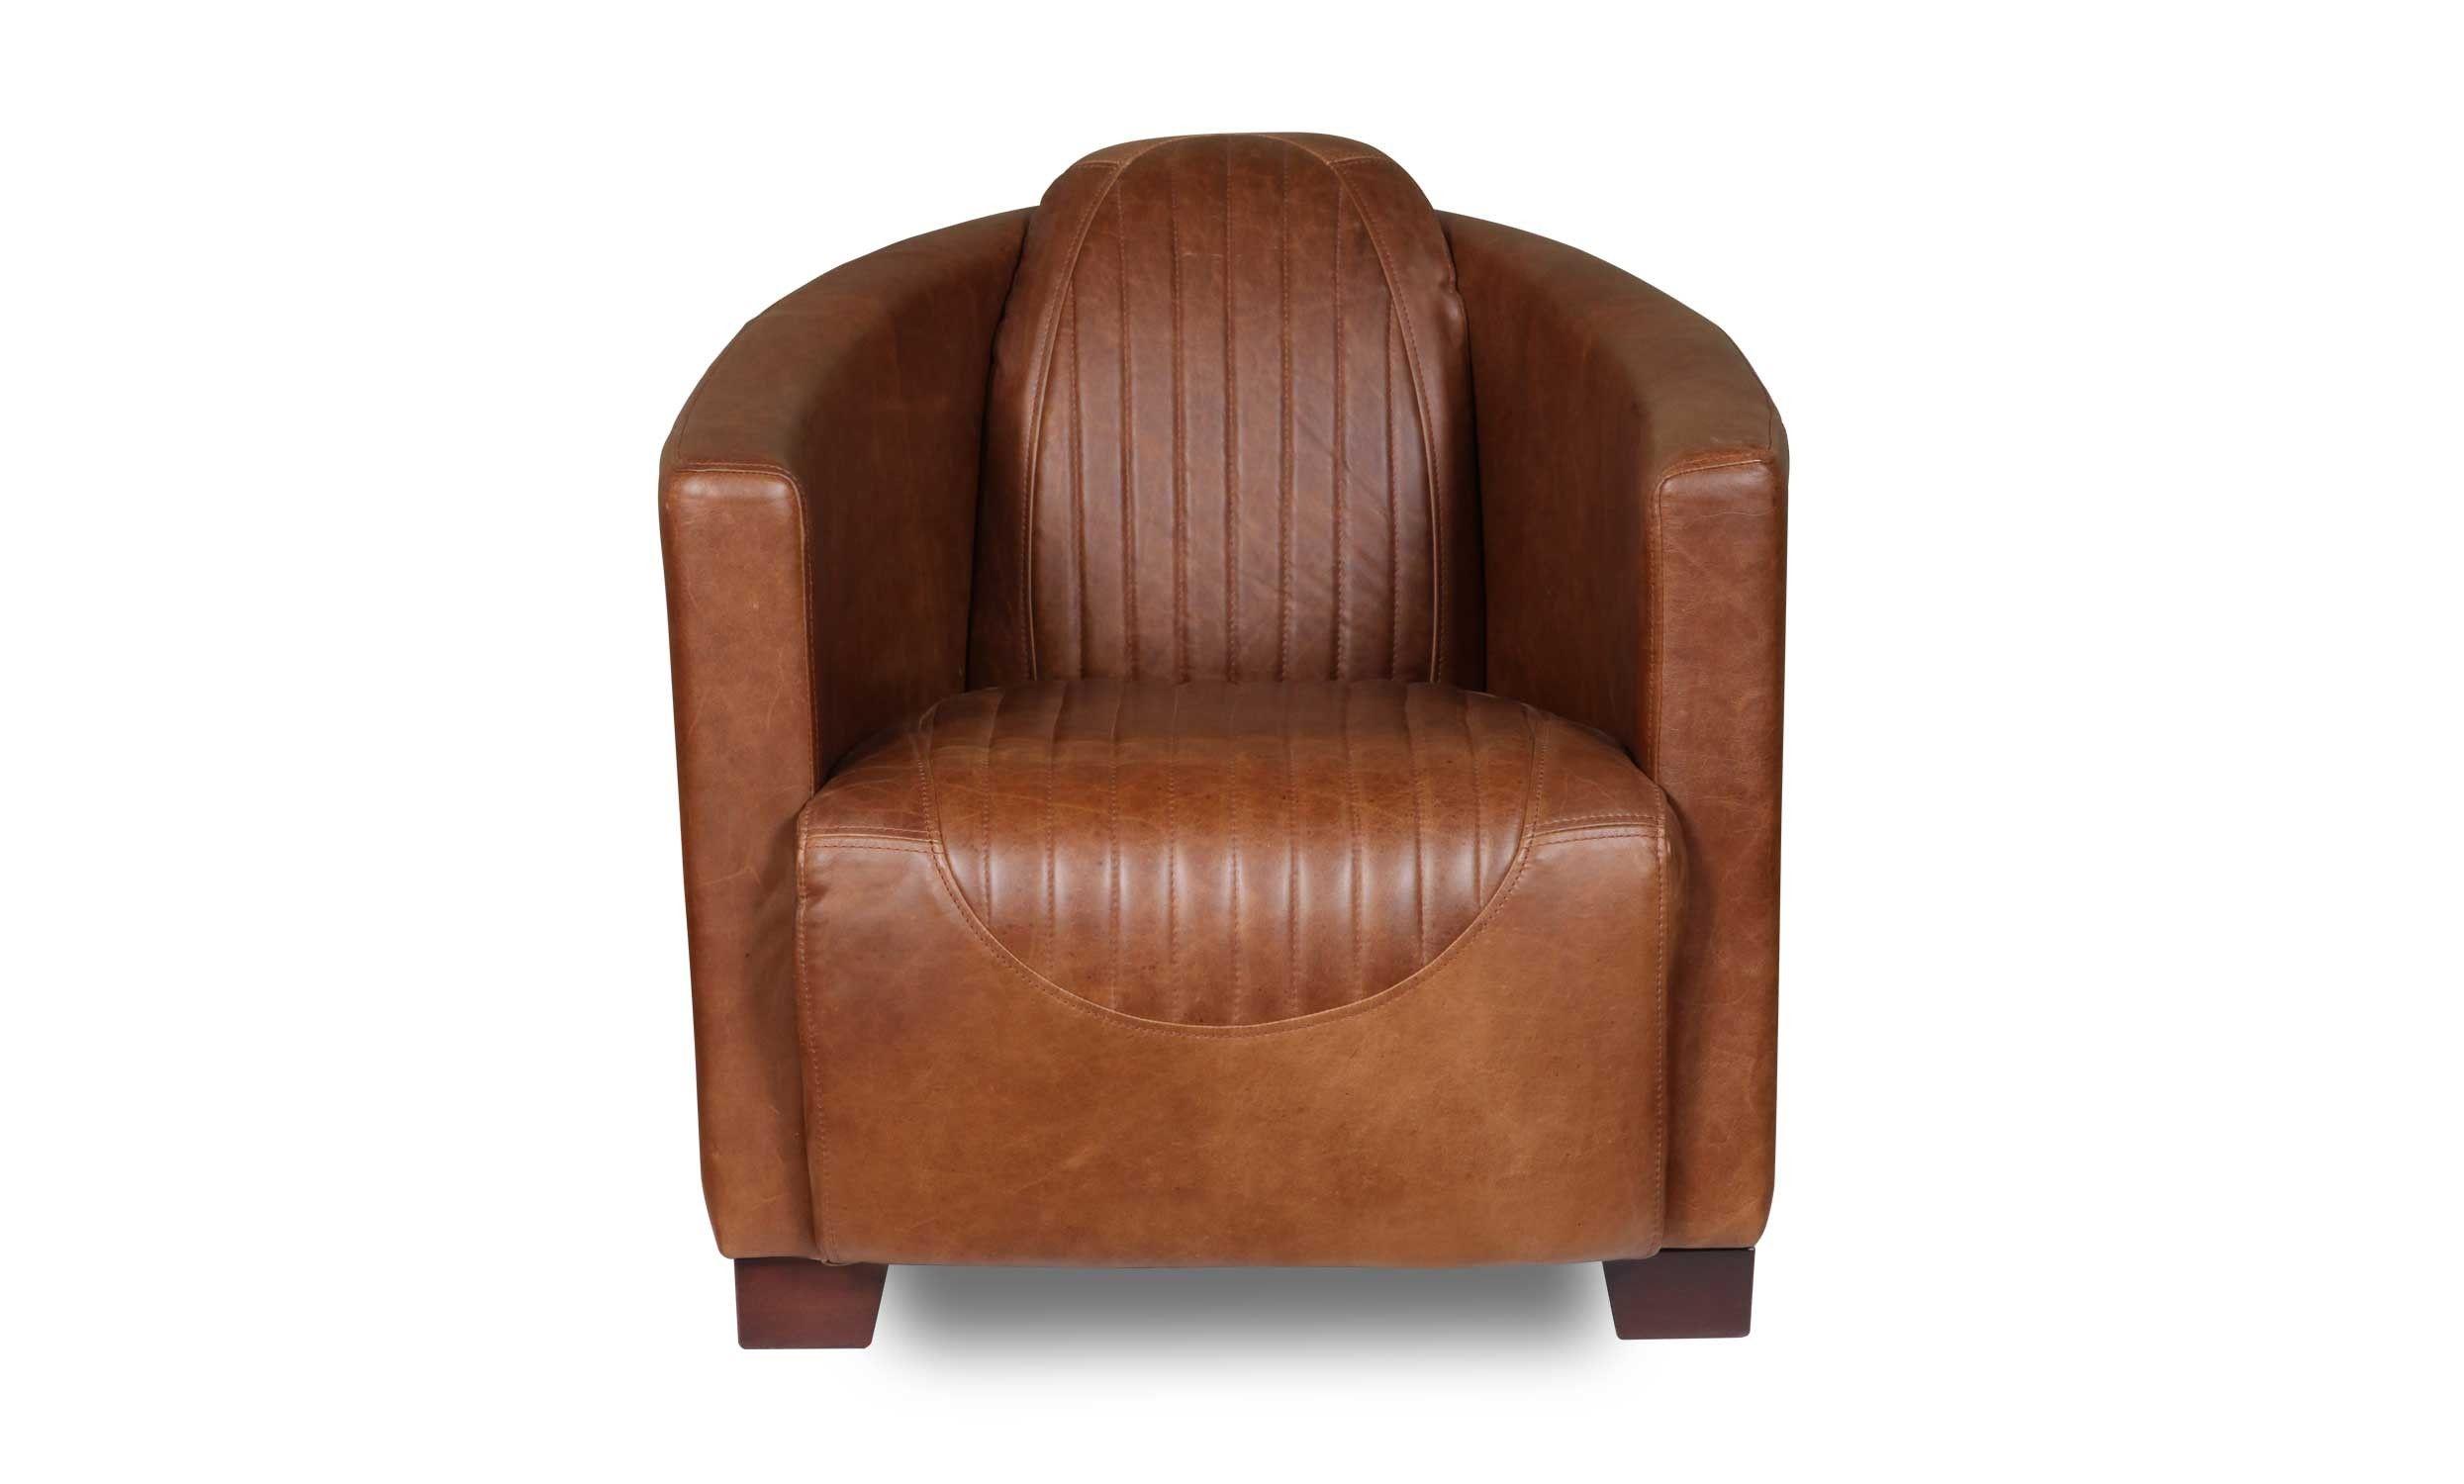 Aviator Chair Aviator Leather Sofa Ranges Sofas & Chairs TR